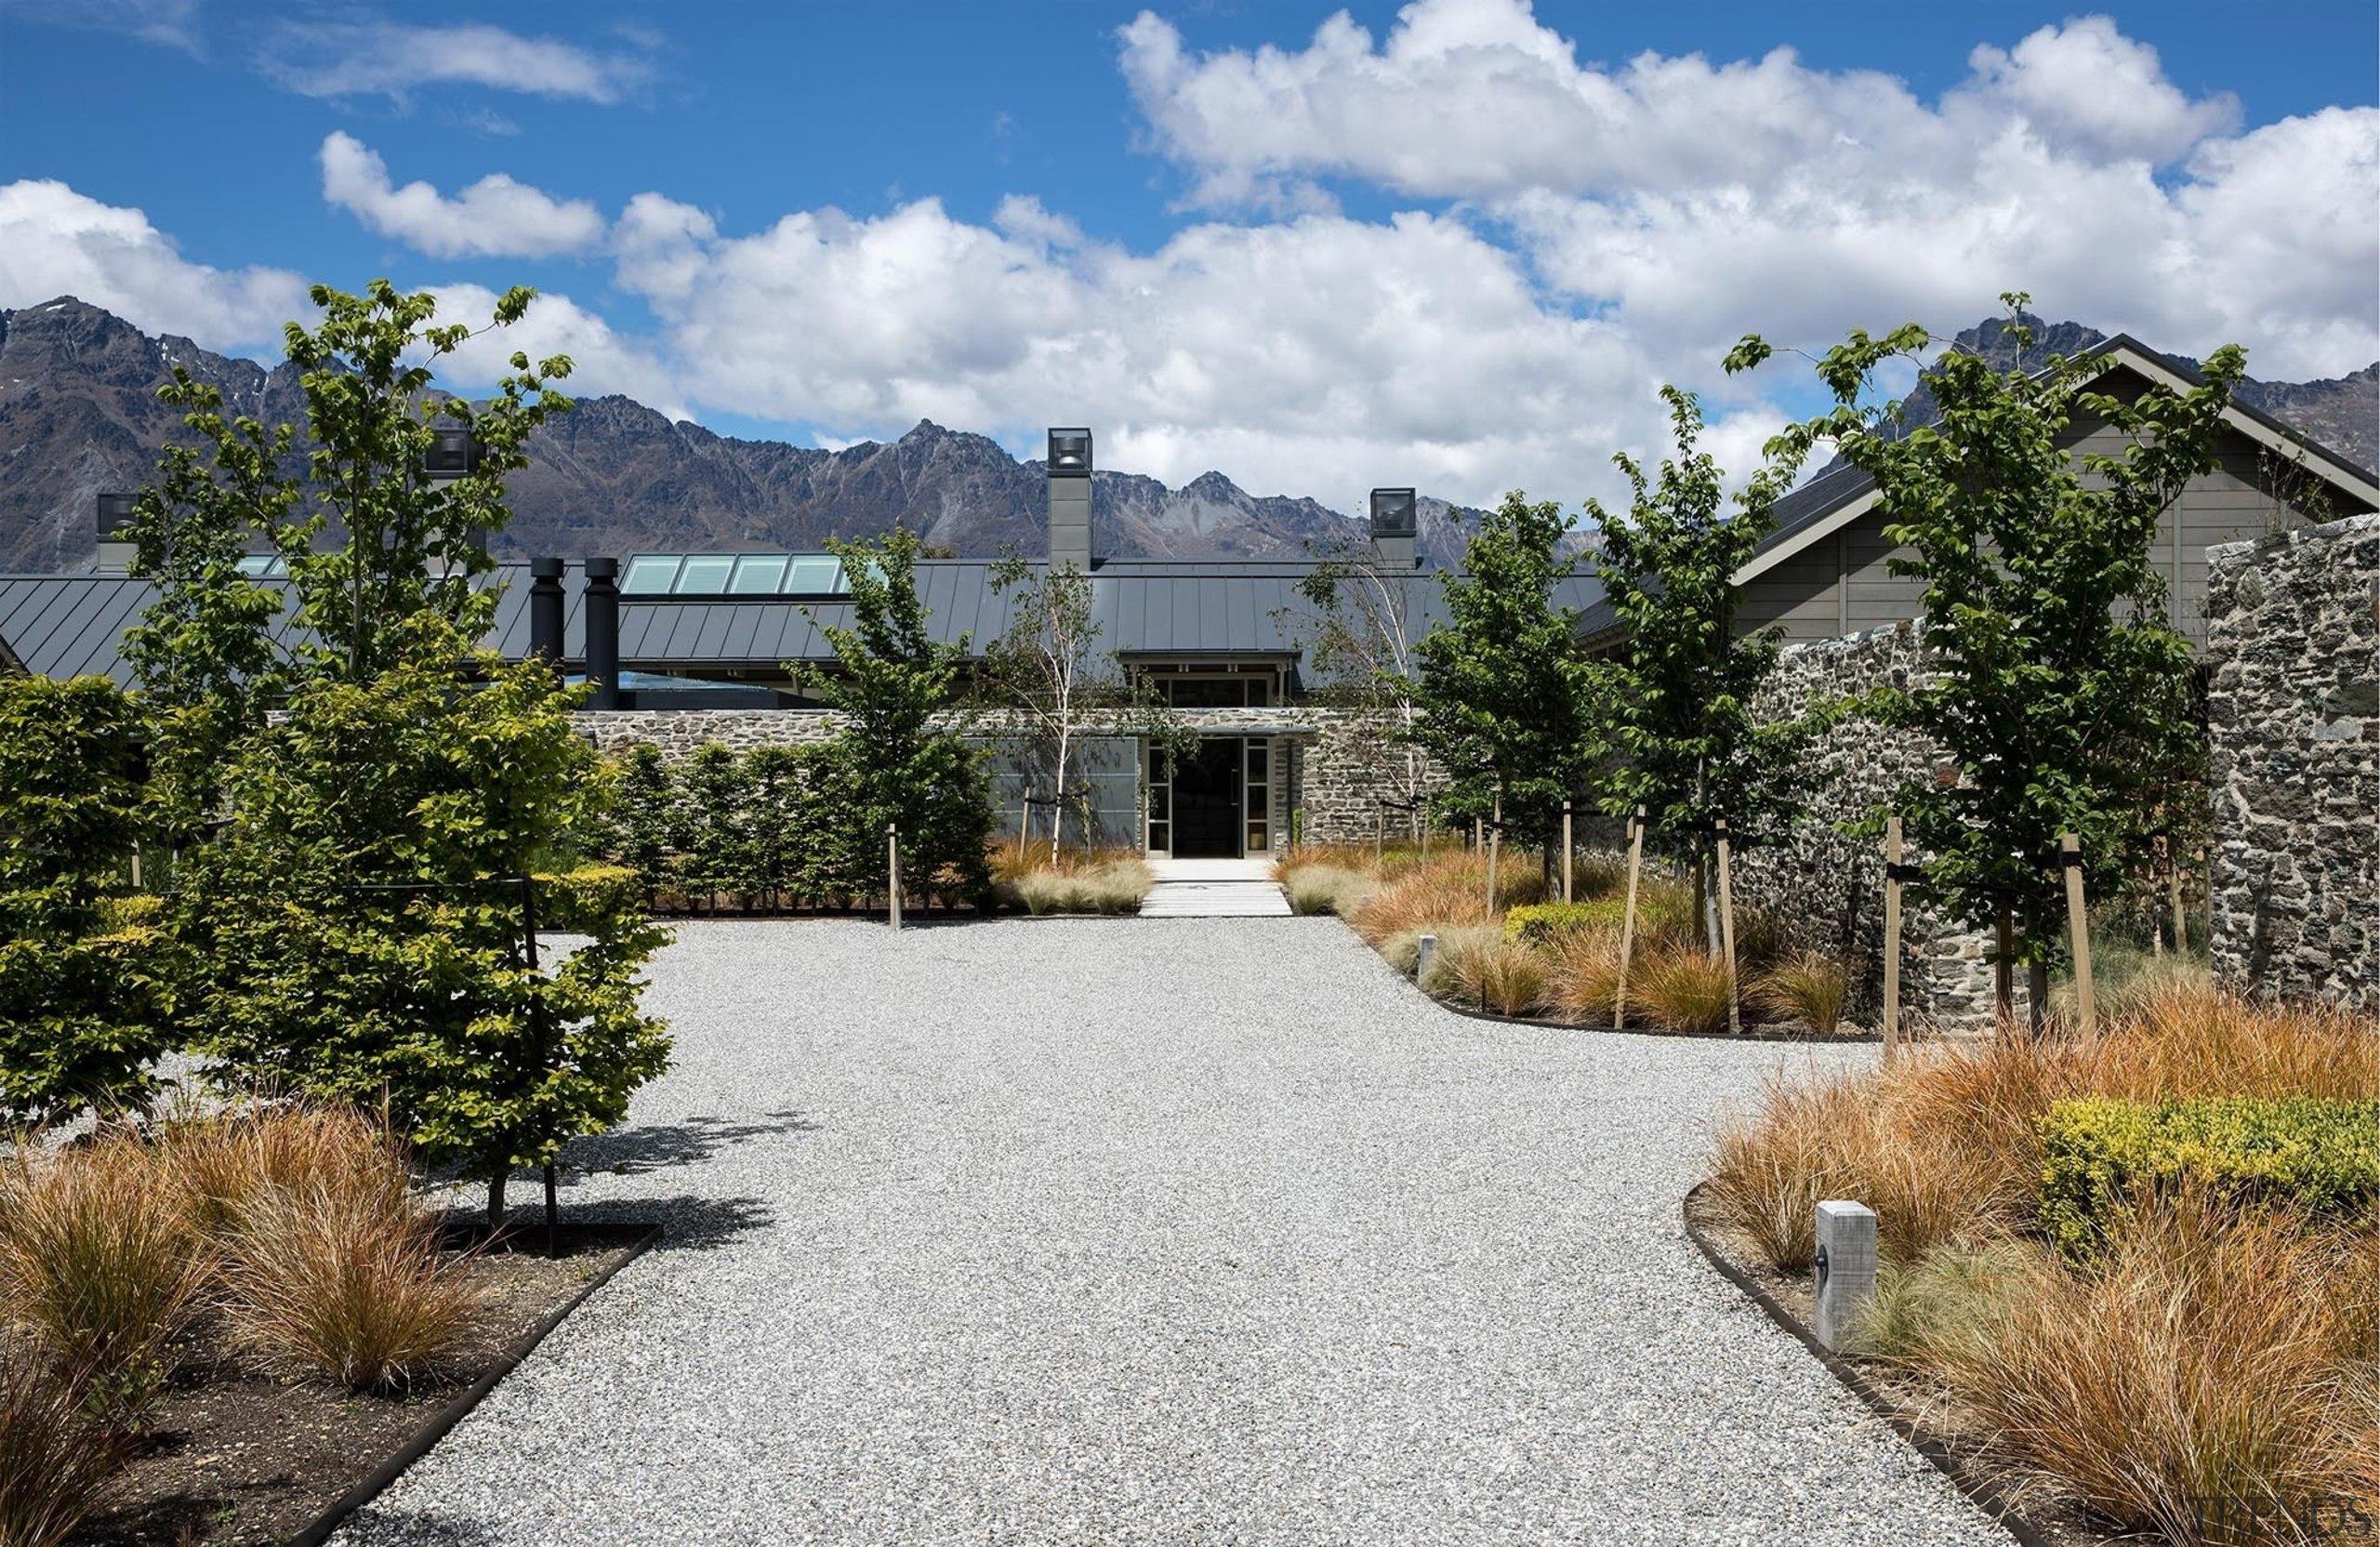 Closeburn Station - Sumich Chaplin - Closeburn Station cottage, estate, home, house, landscape, property, real estate, residential area, sky, gray